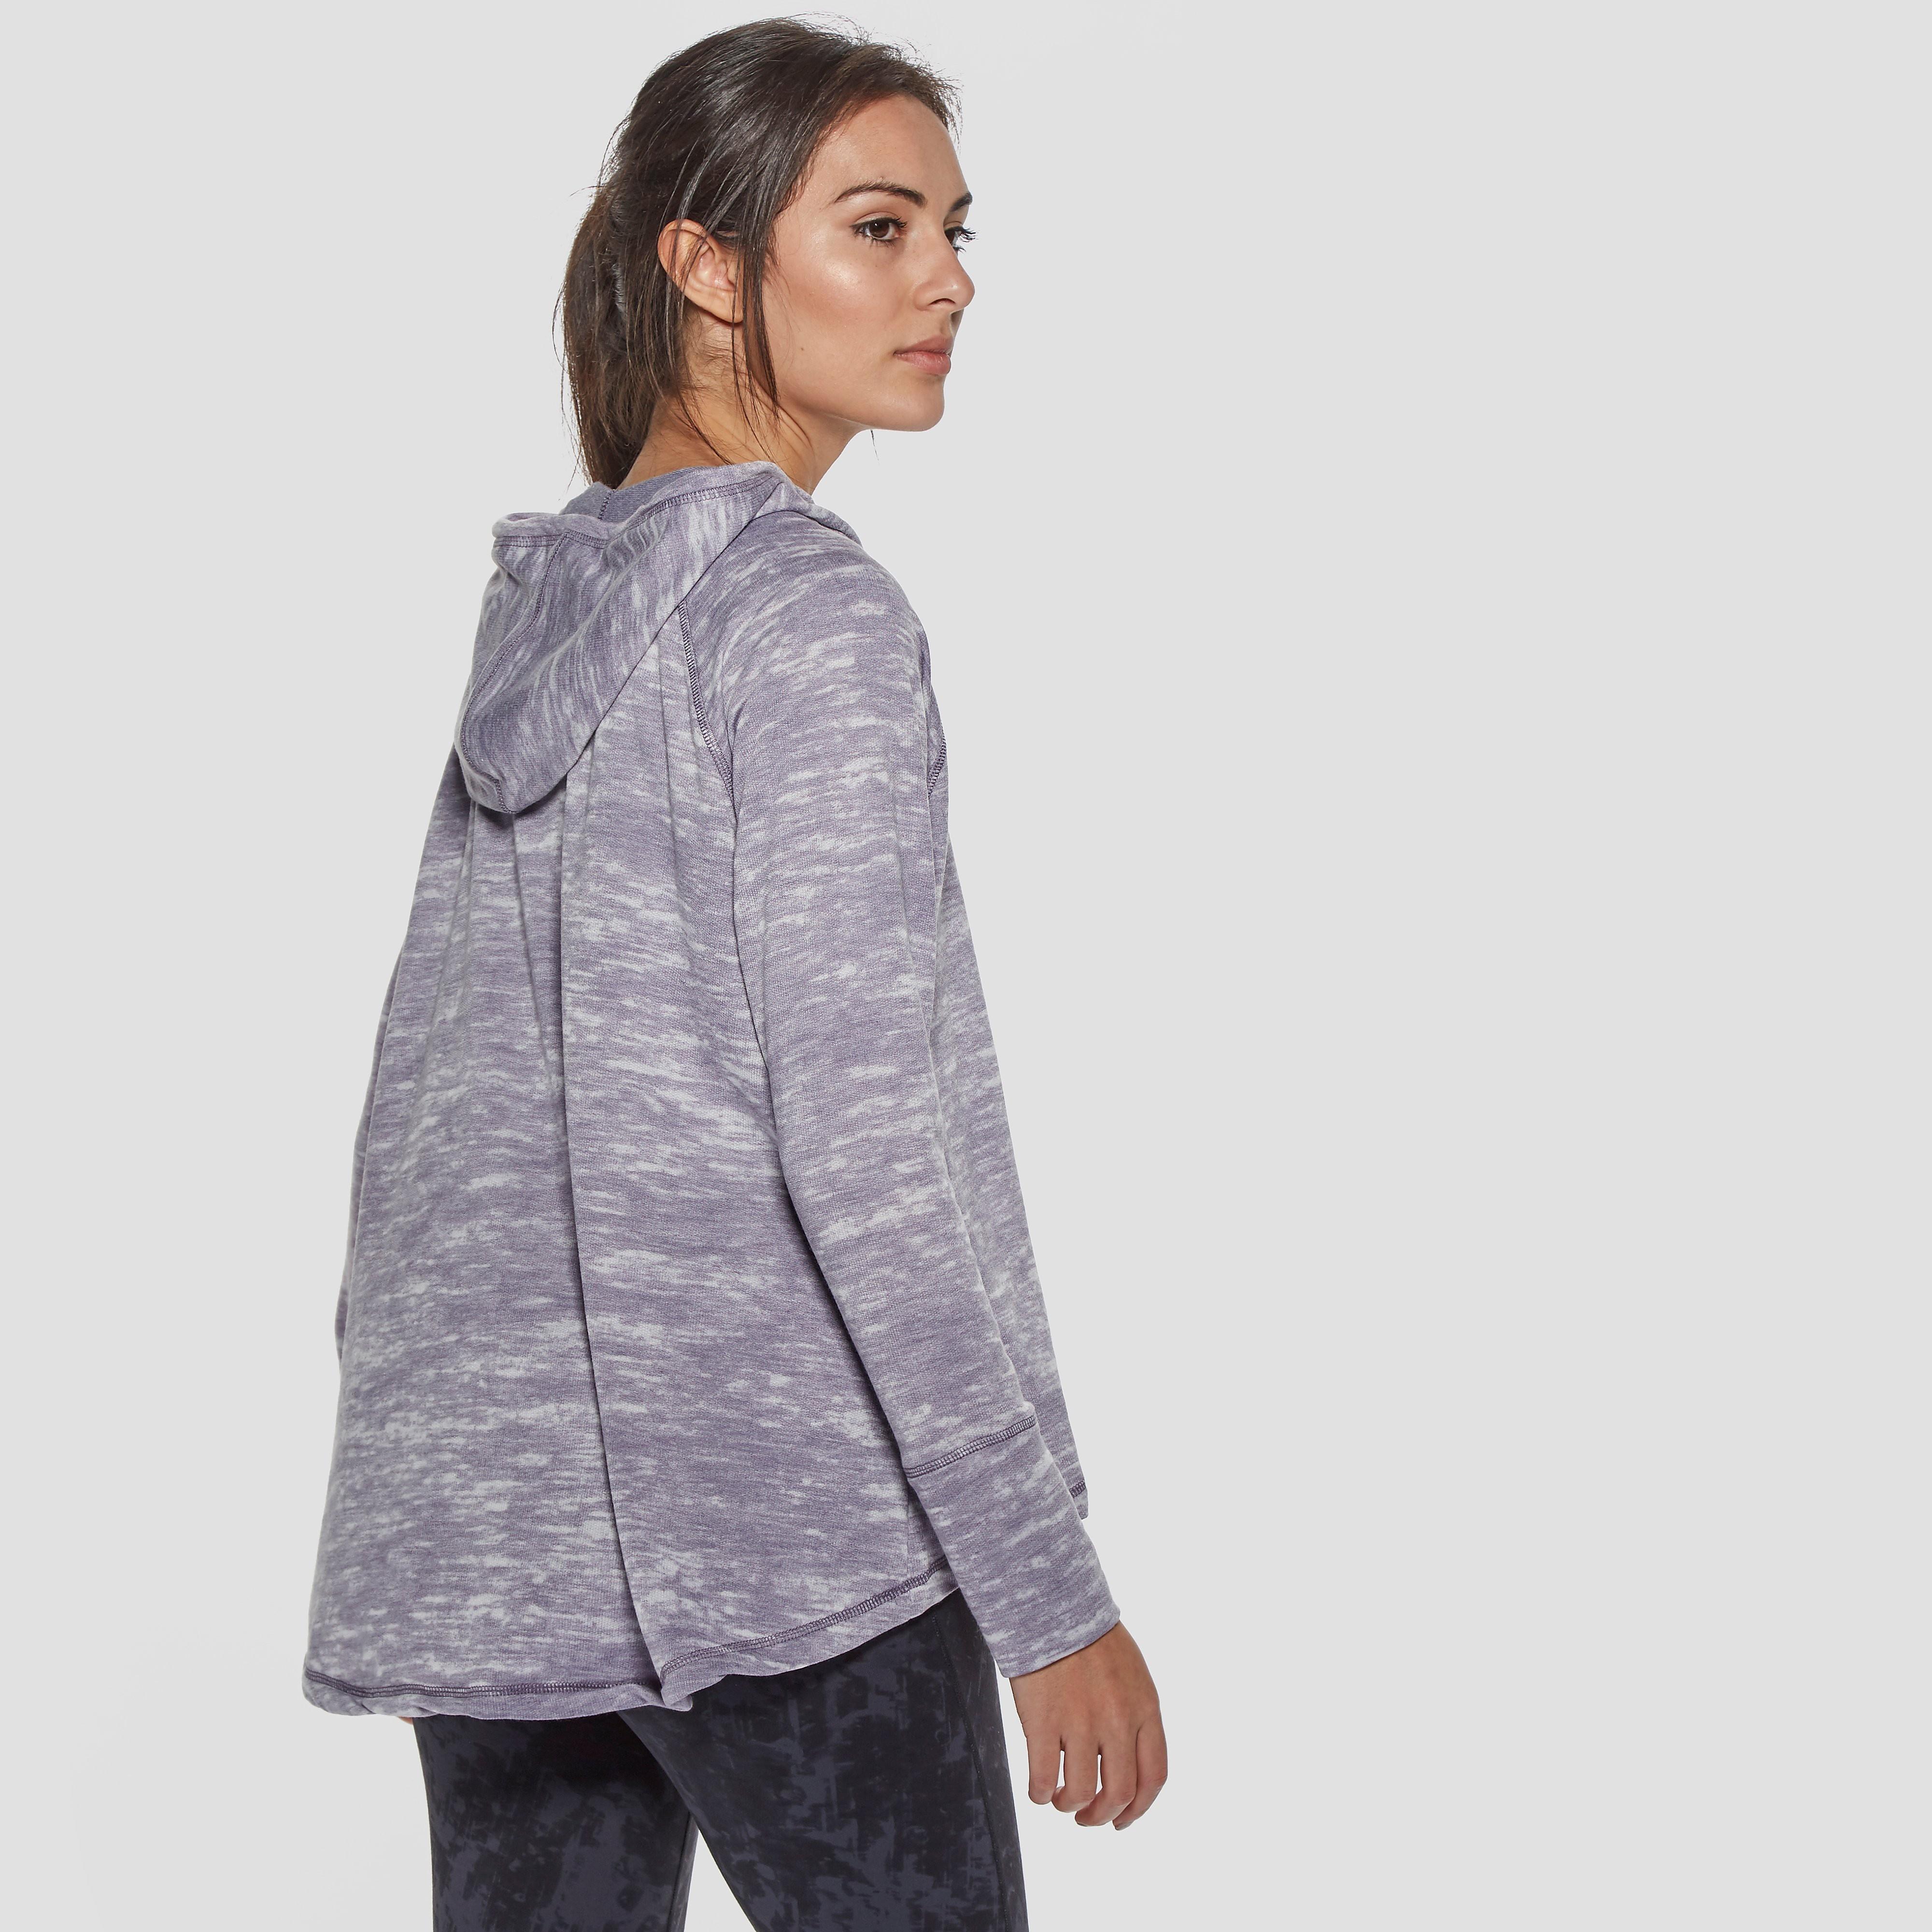 New Balance Hatha Women's Hoodie